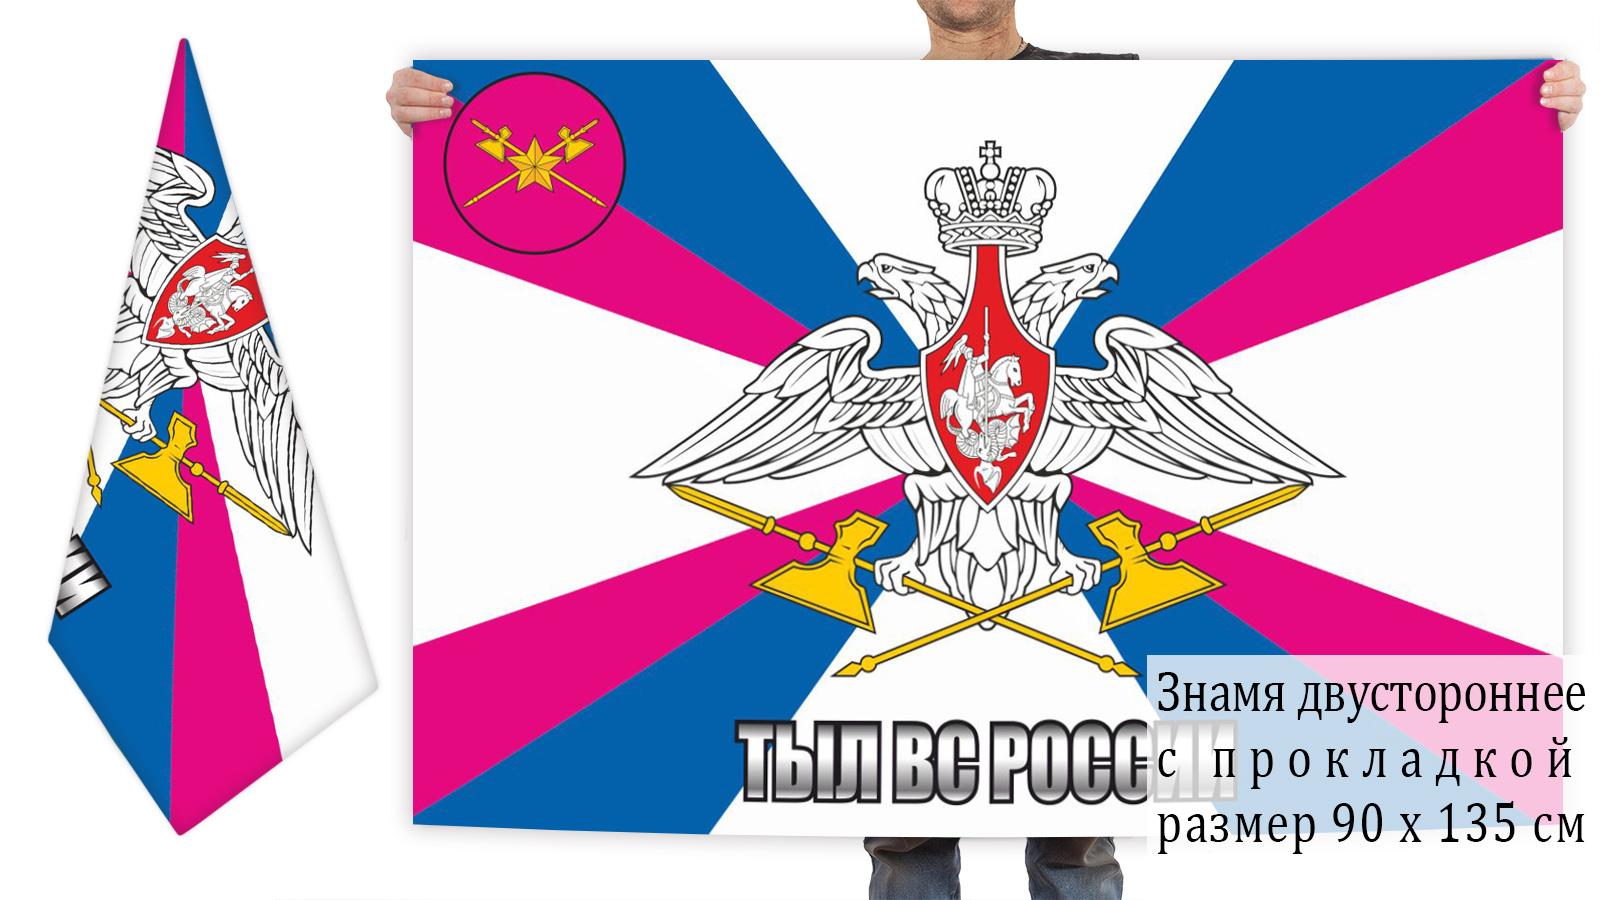 Двусторонний флаг тыла ВС России